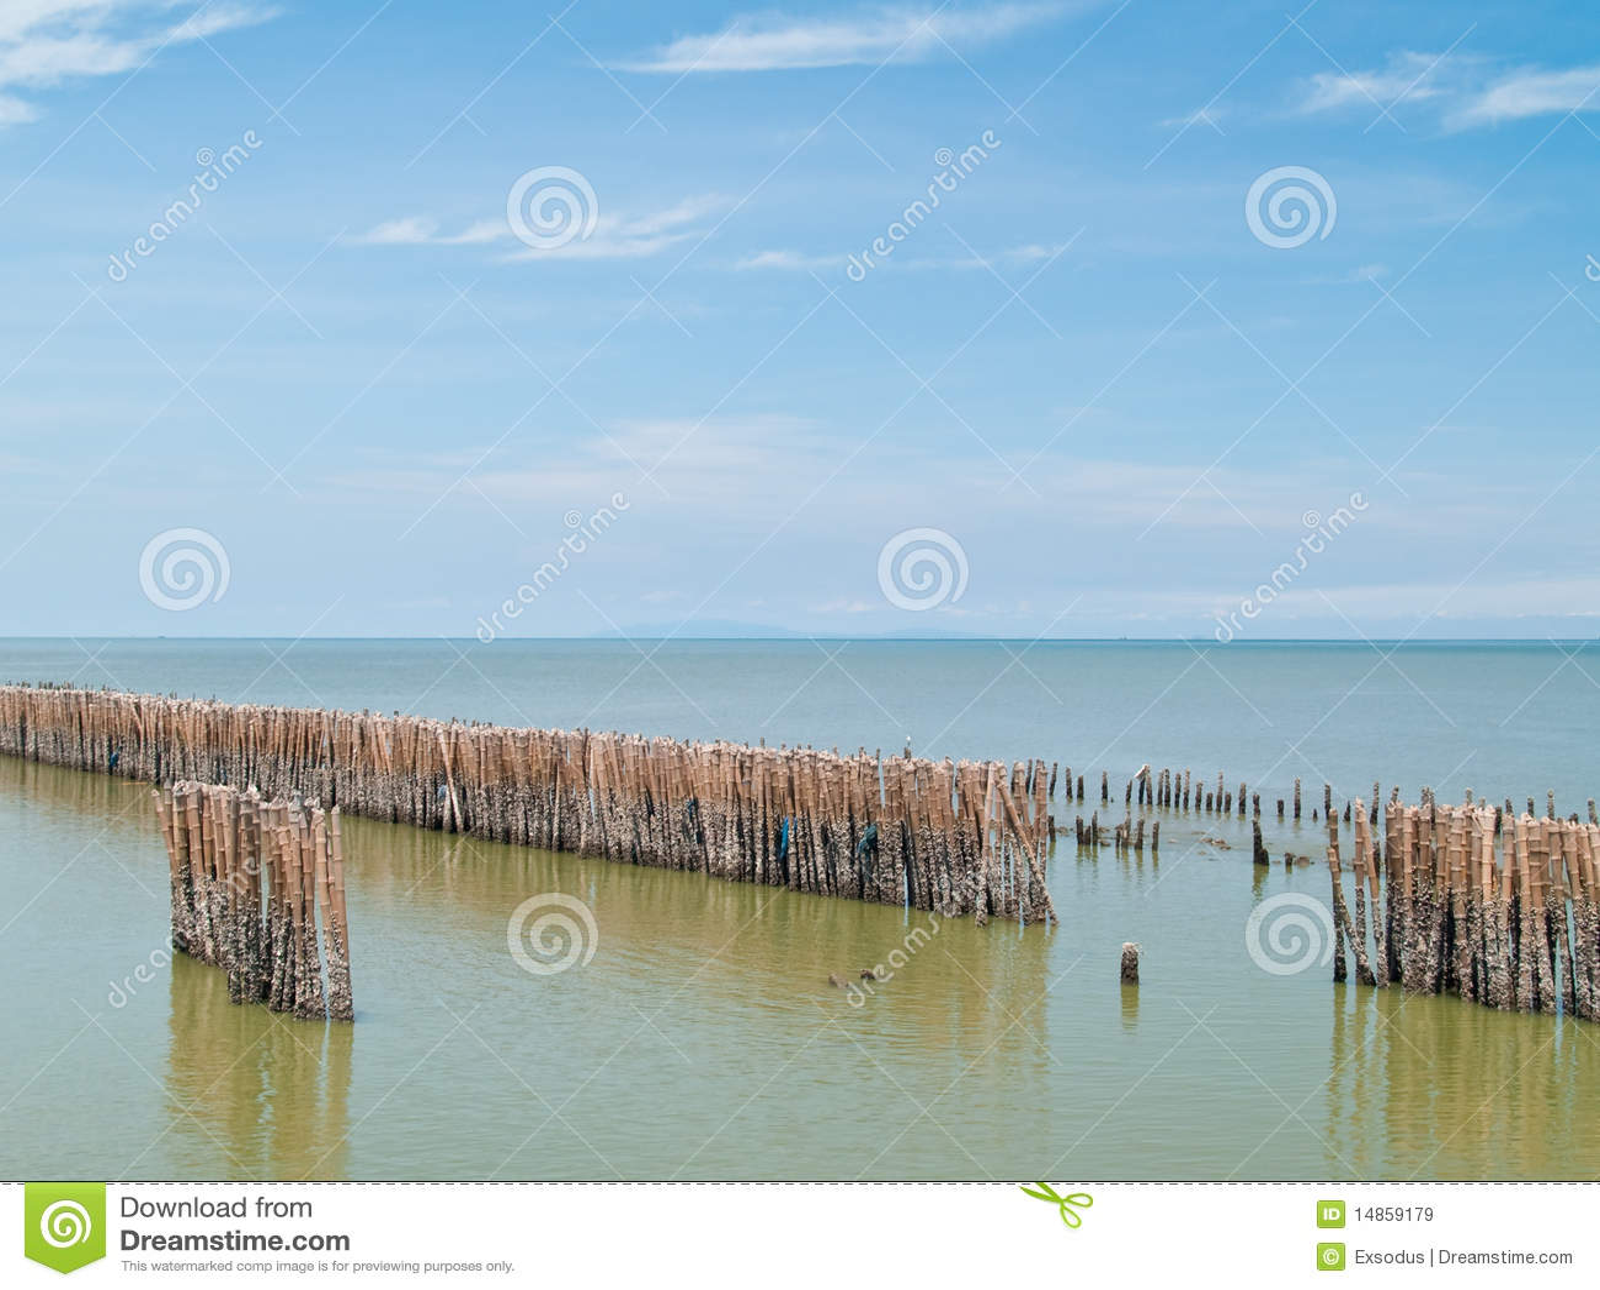 Fence bamboo row